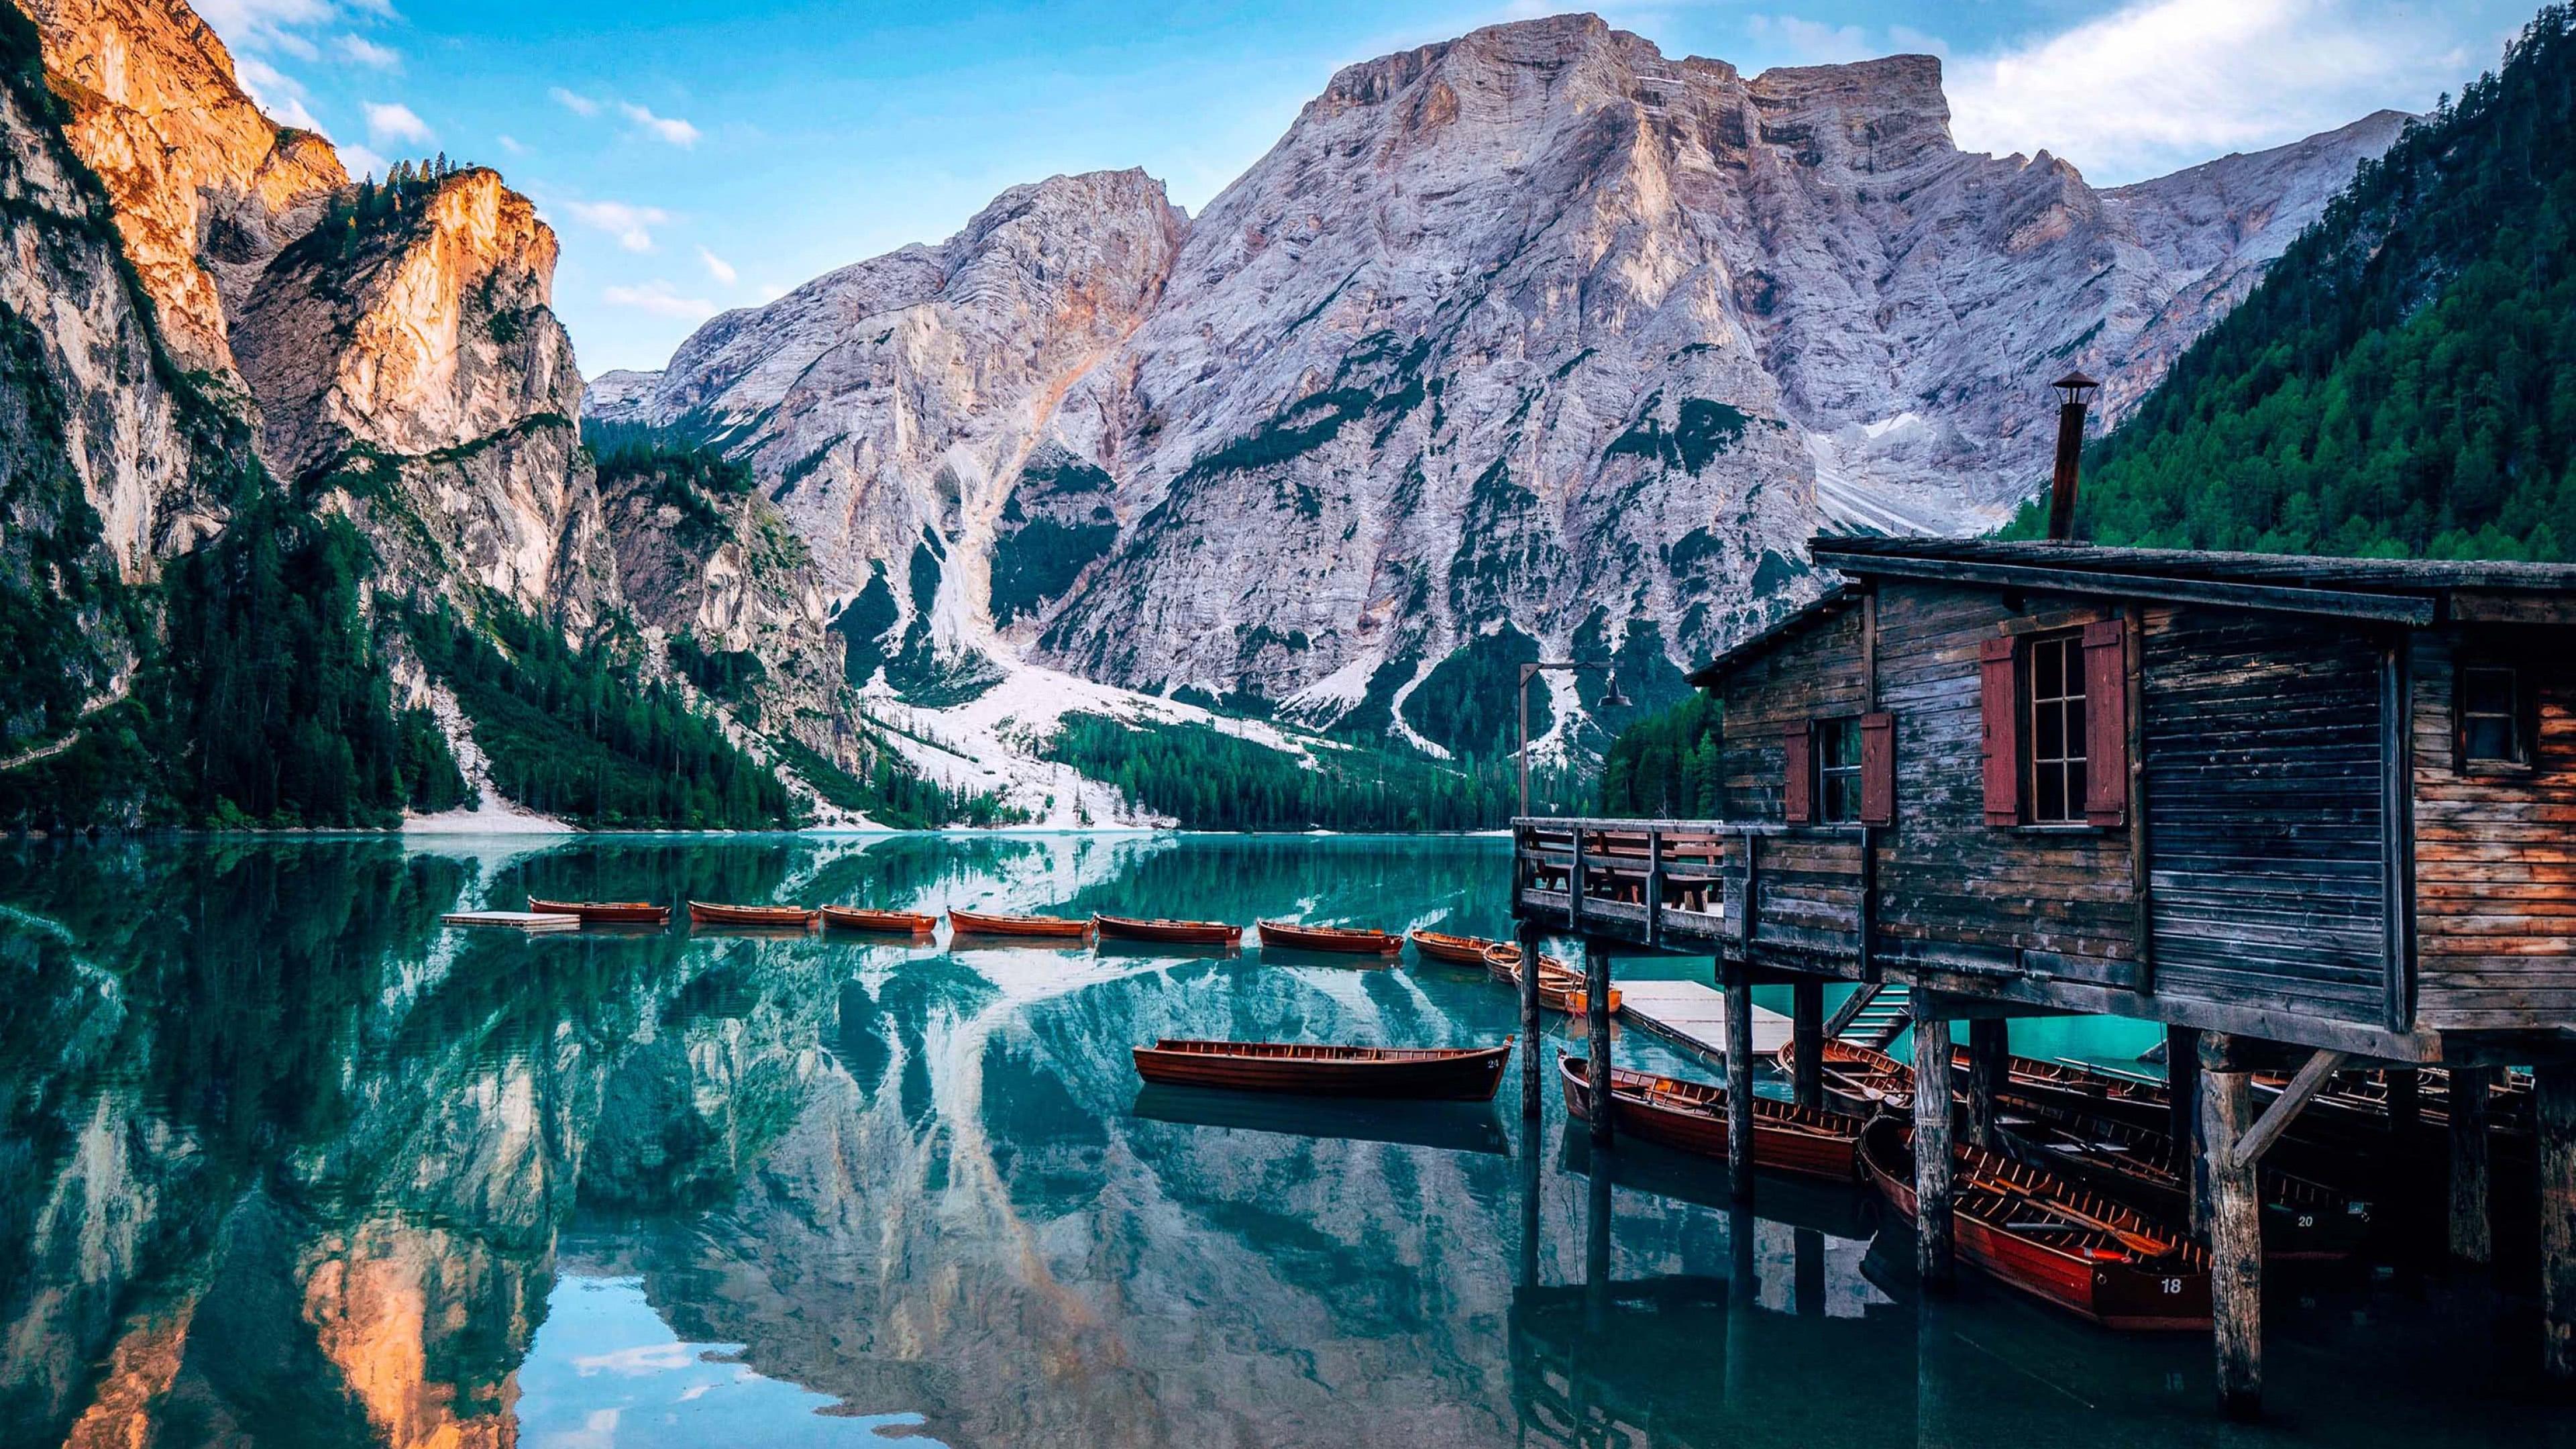 Wallpaper Lake House Boat Mountain Pass Reflection